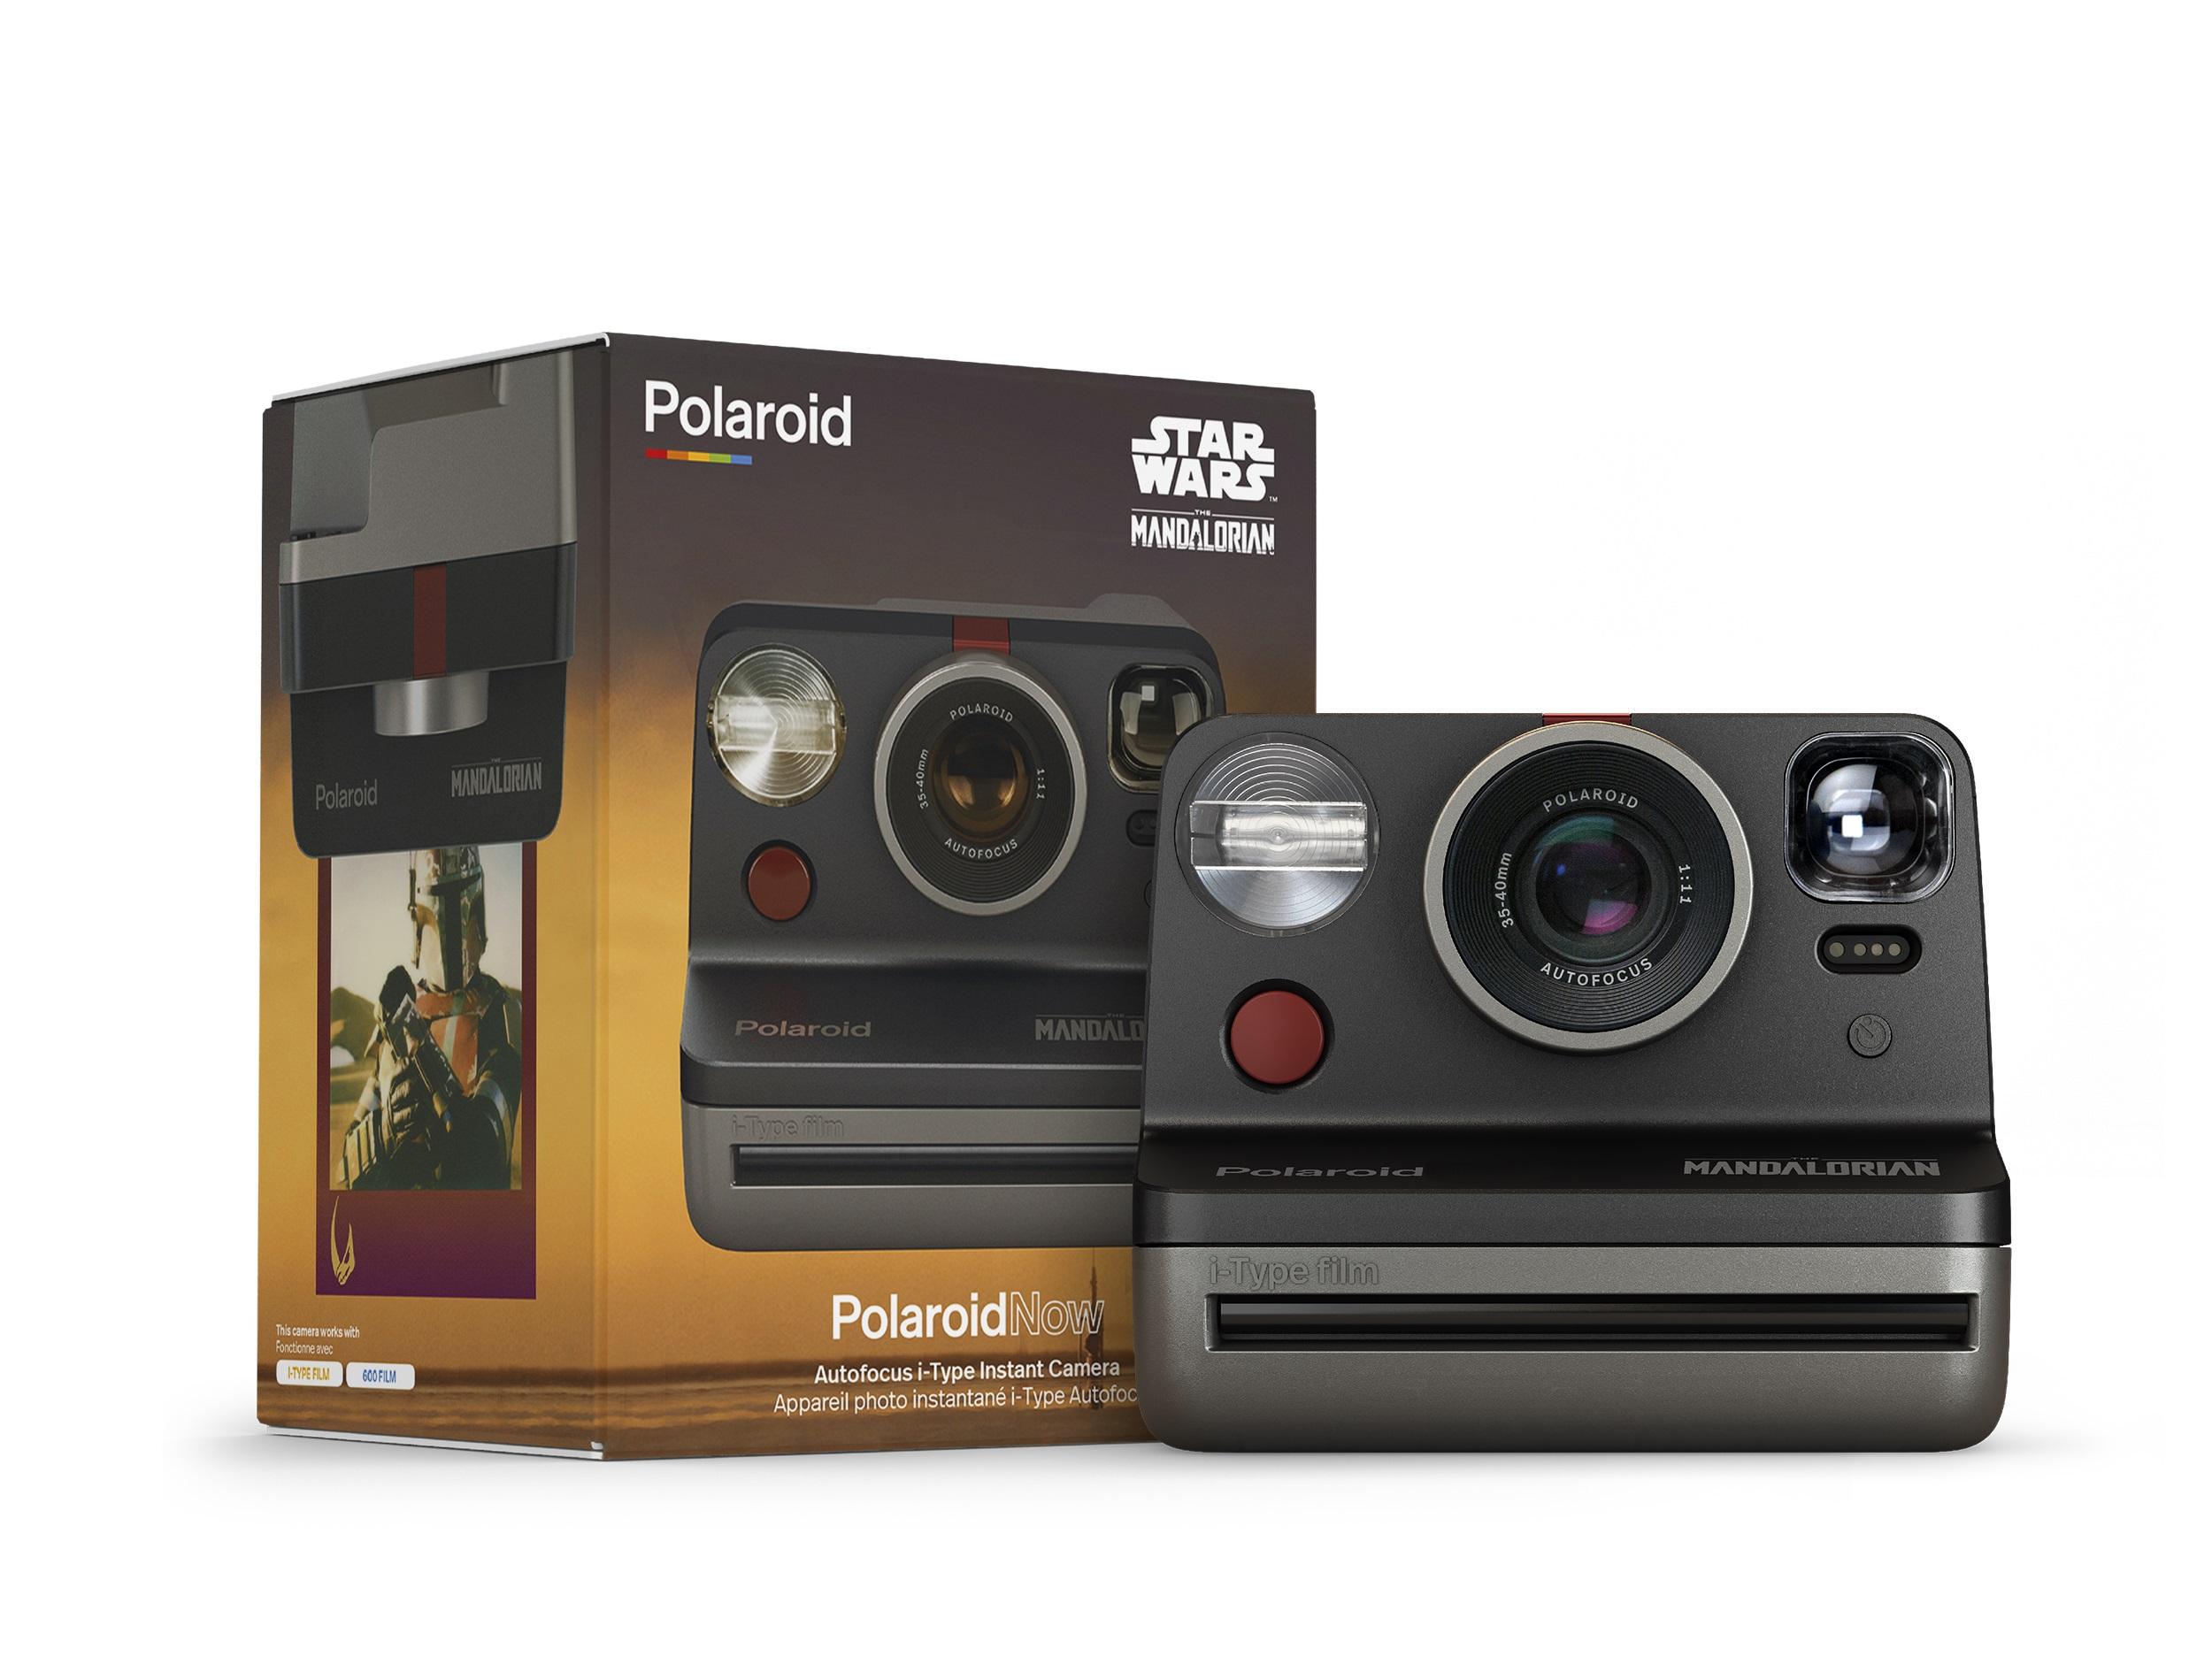 Polaroid - Star Wars Mandalorian Camera